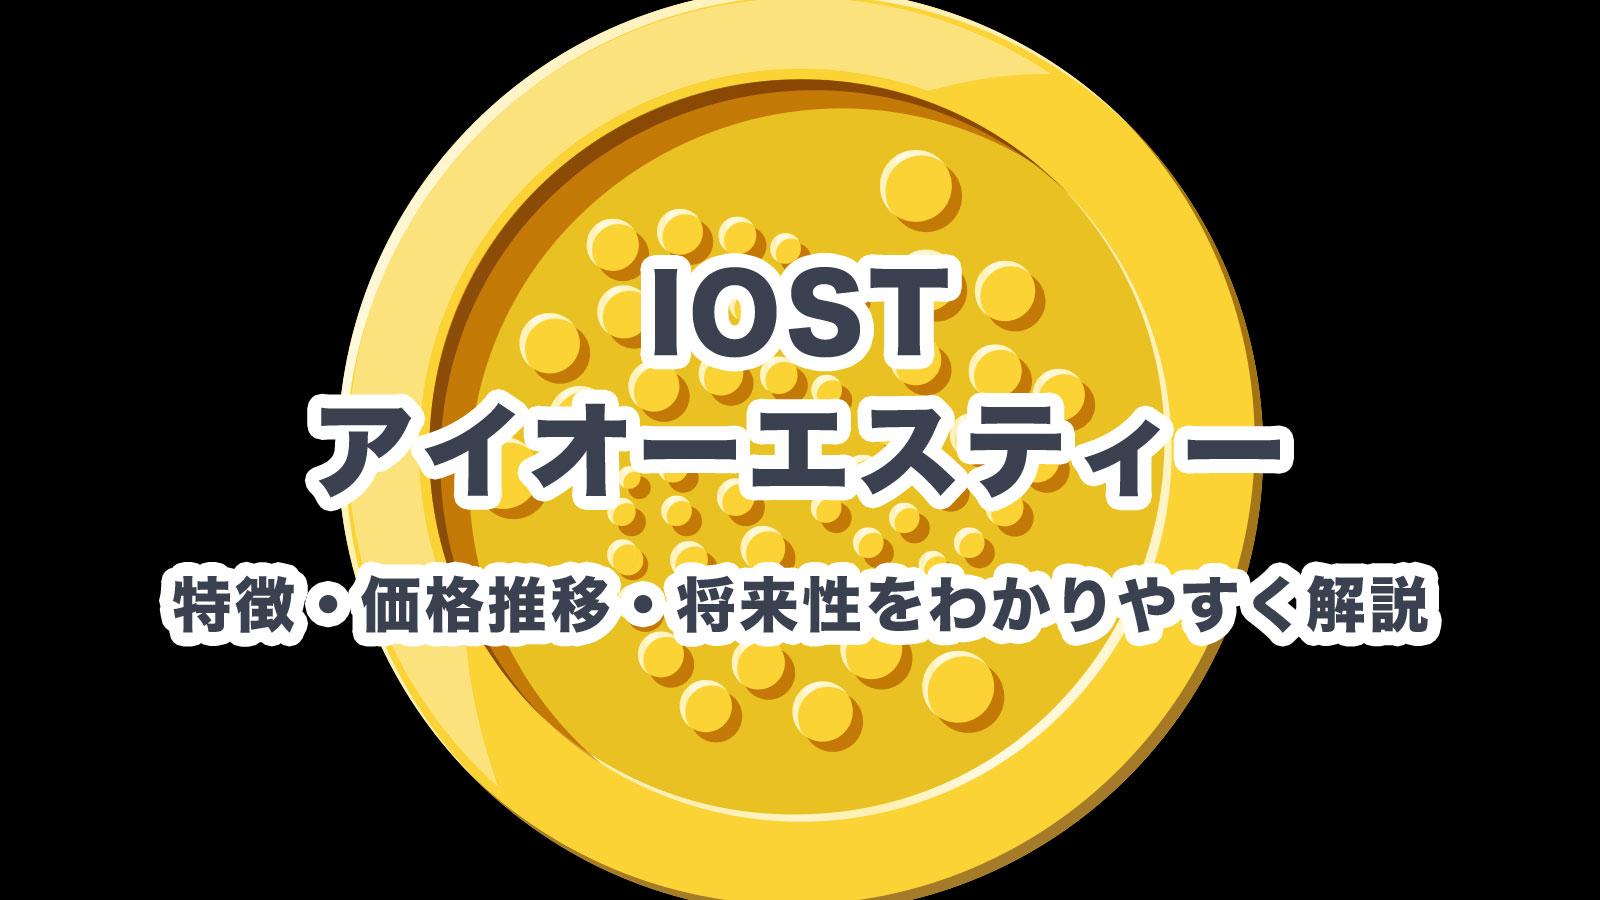 IOST(アイオーエスティー)とは?特徴・価格推移・将来性をわかりやすく解説